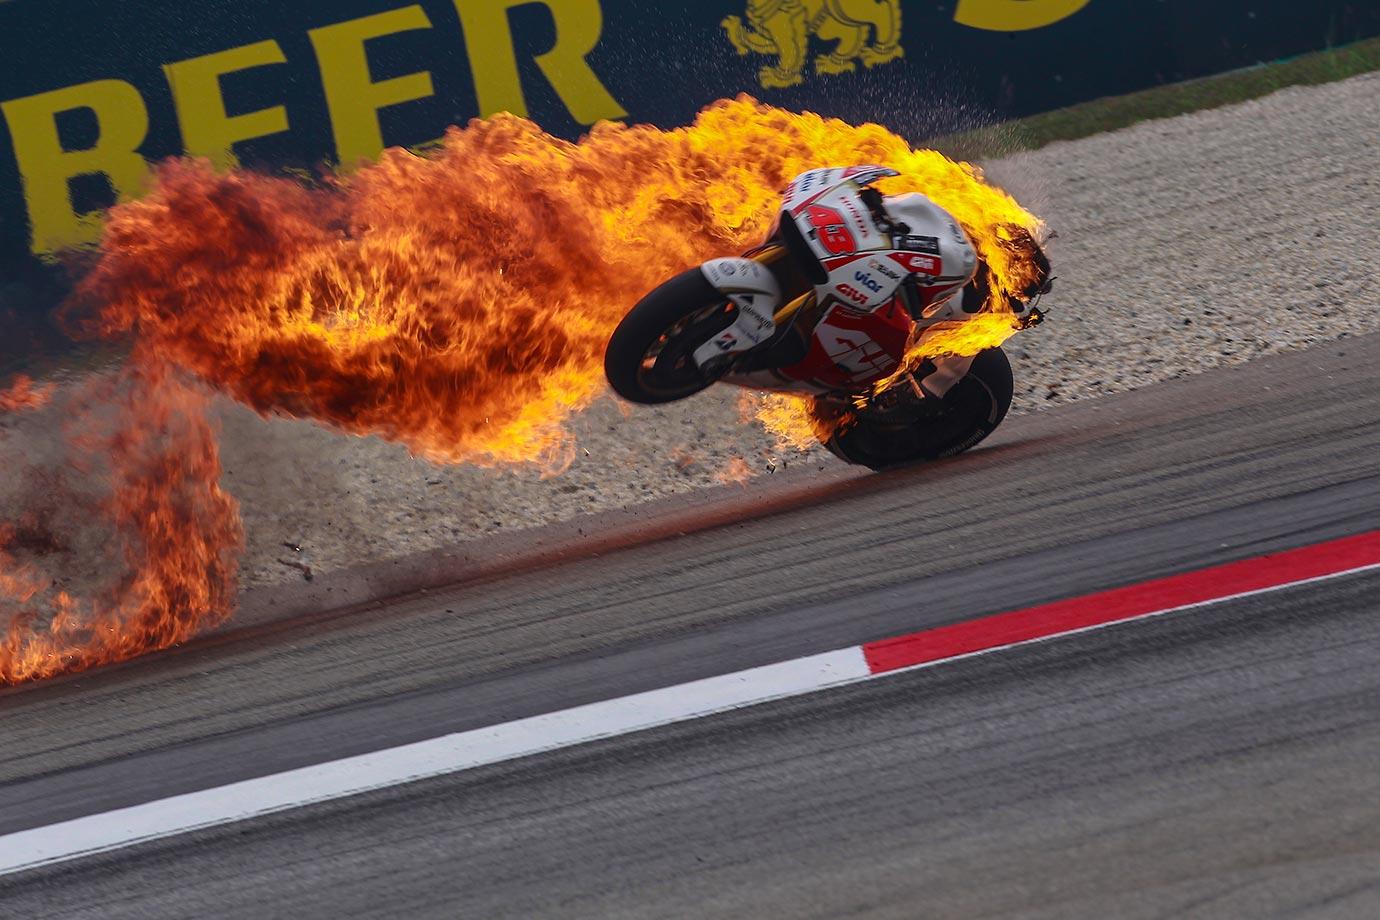 Jack Miller's Honda bike bursts into flames at Sepang Circuit in Kuala Lumpur, Malaysia.